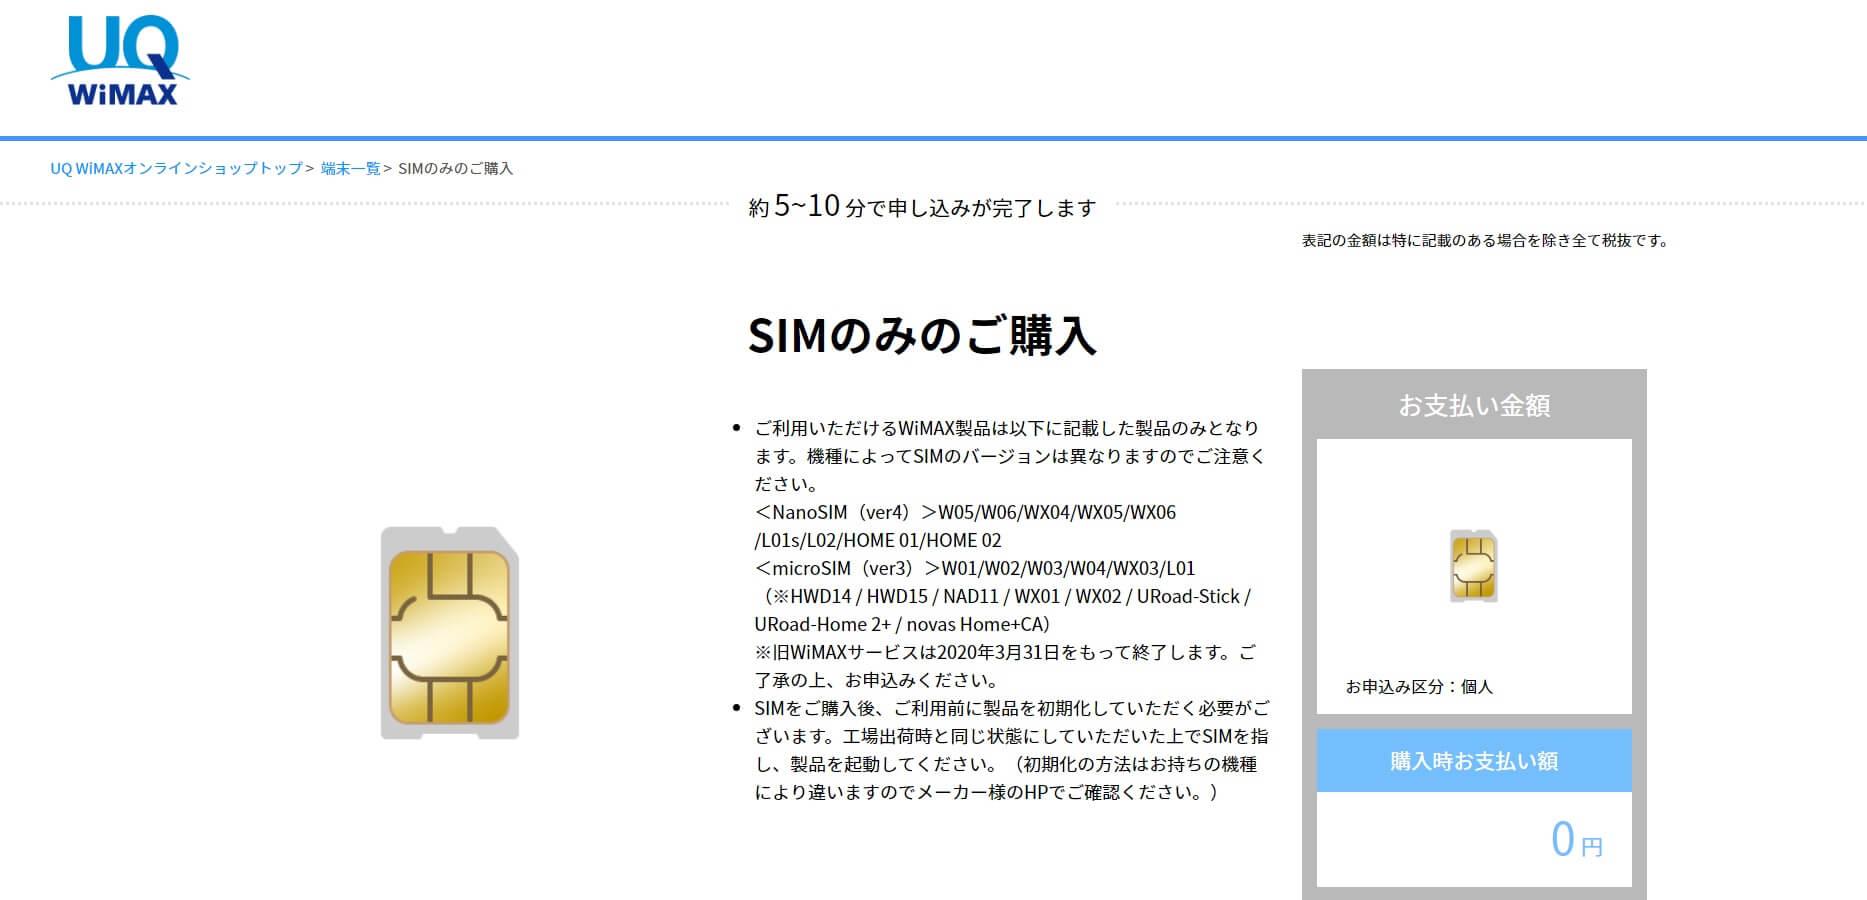 UQ WiMAX公式サイト